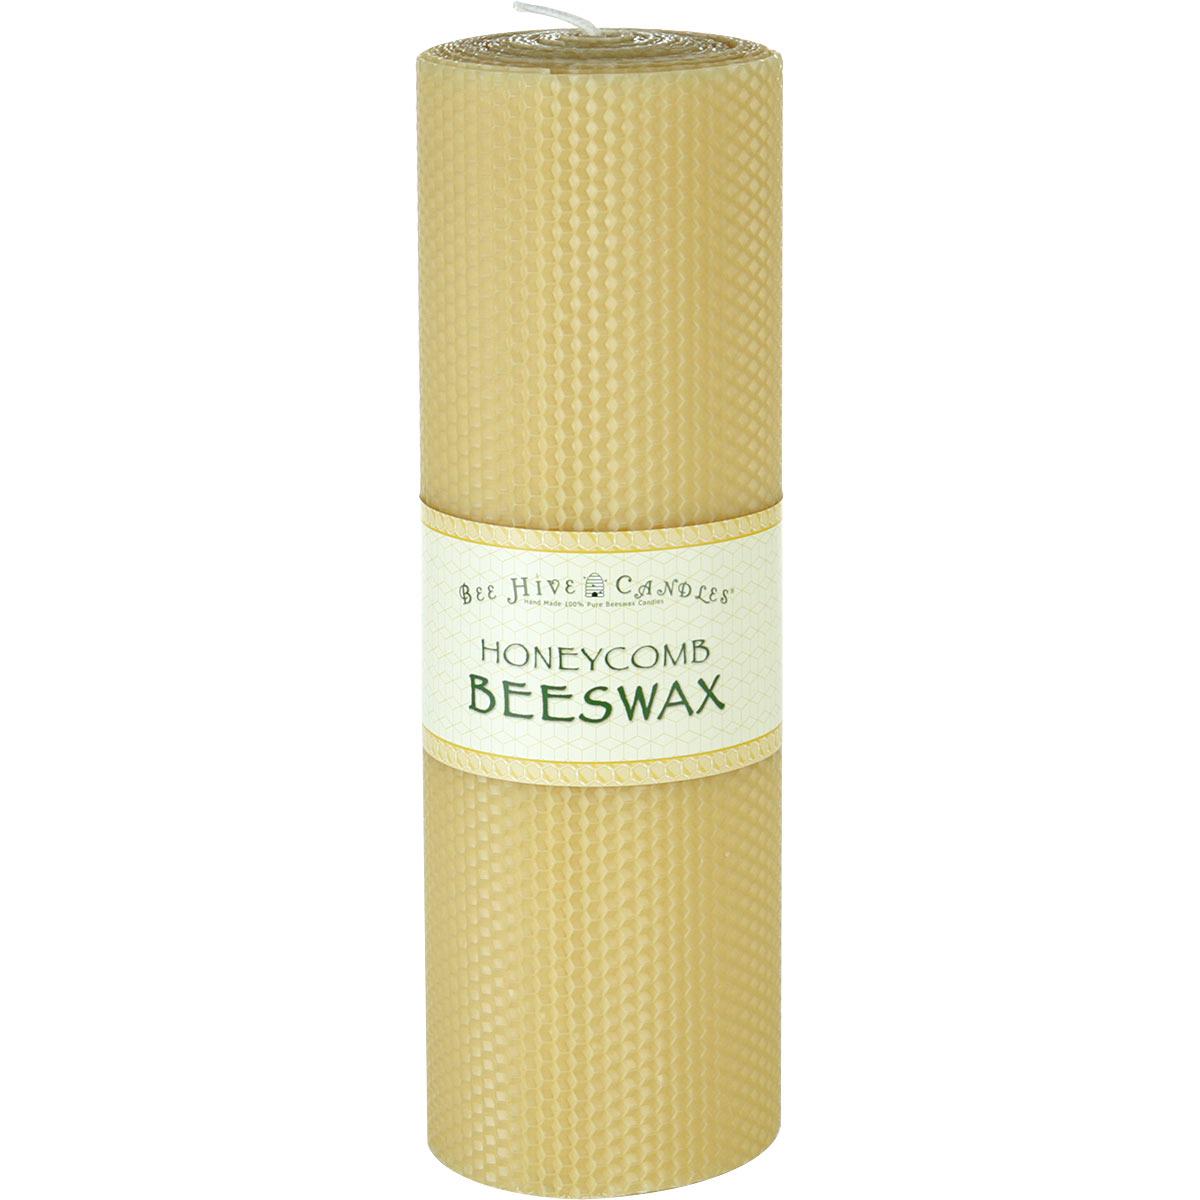 4x12 Honeycomb Beeswax Pillar Candle